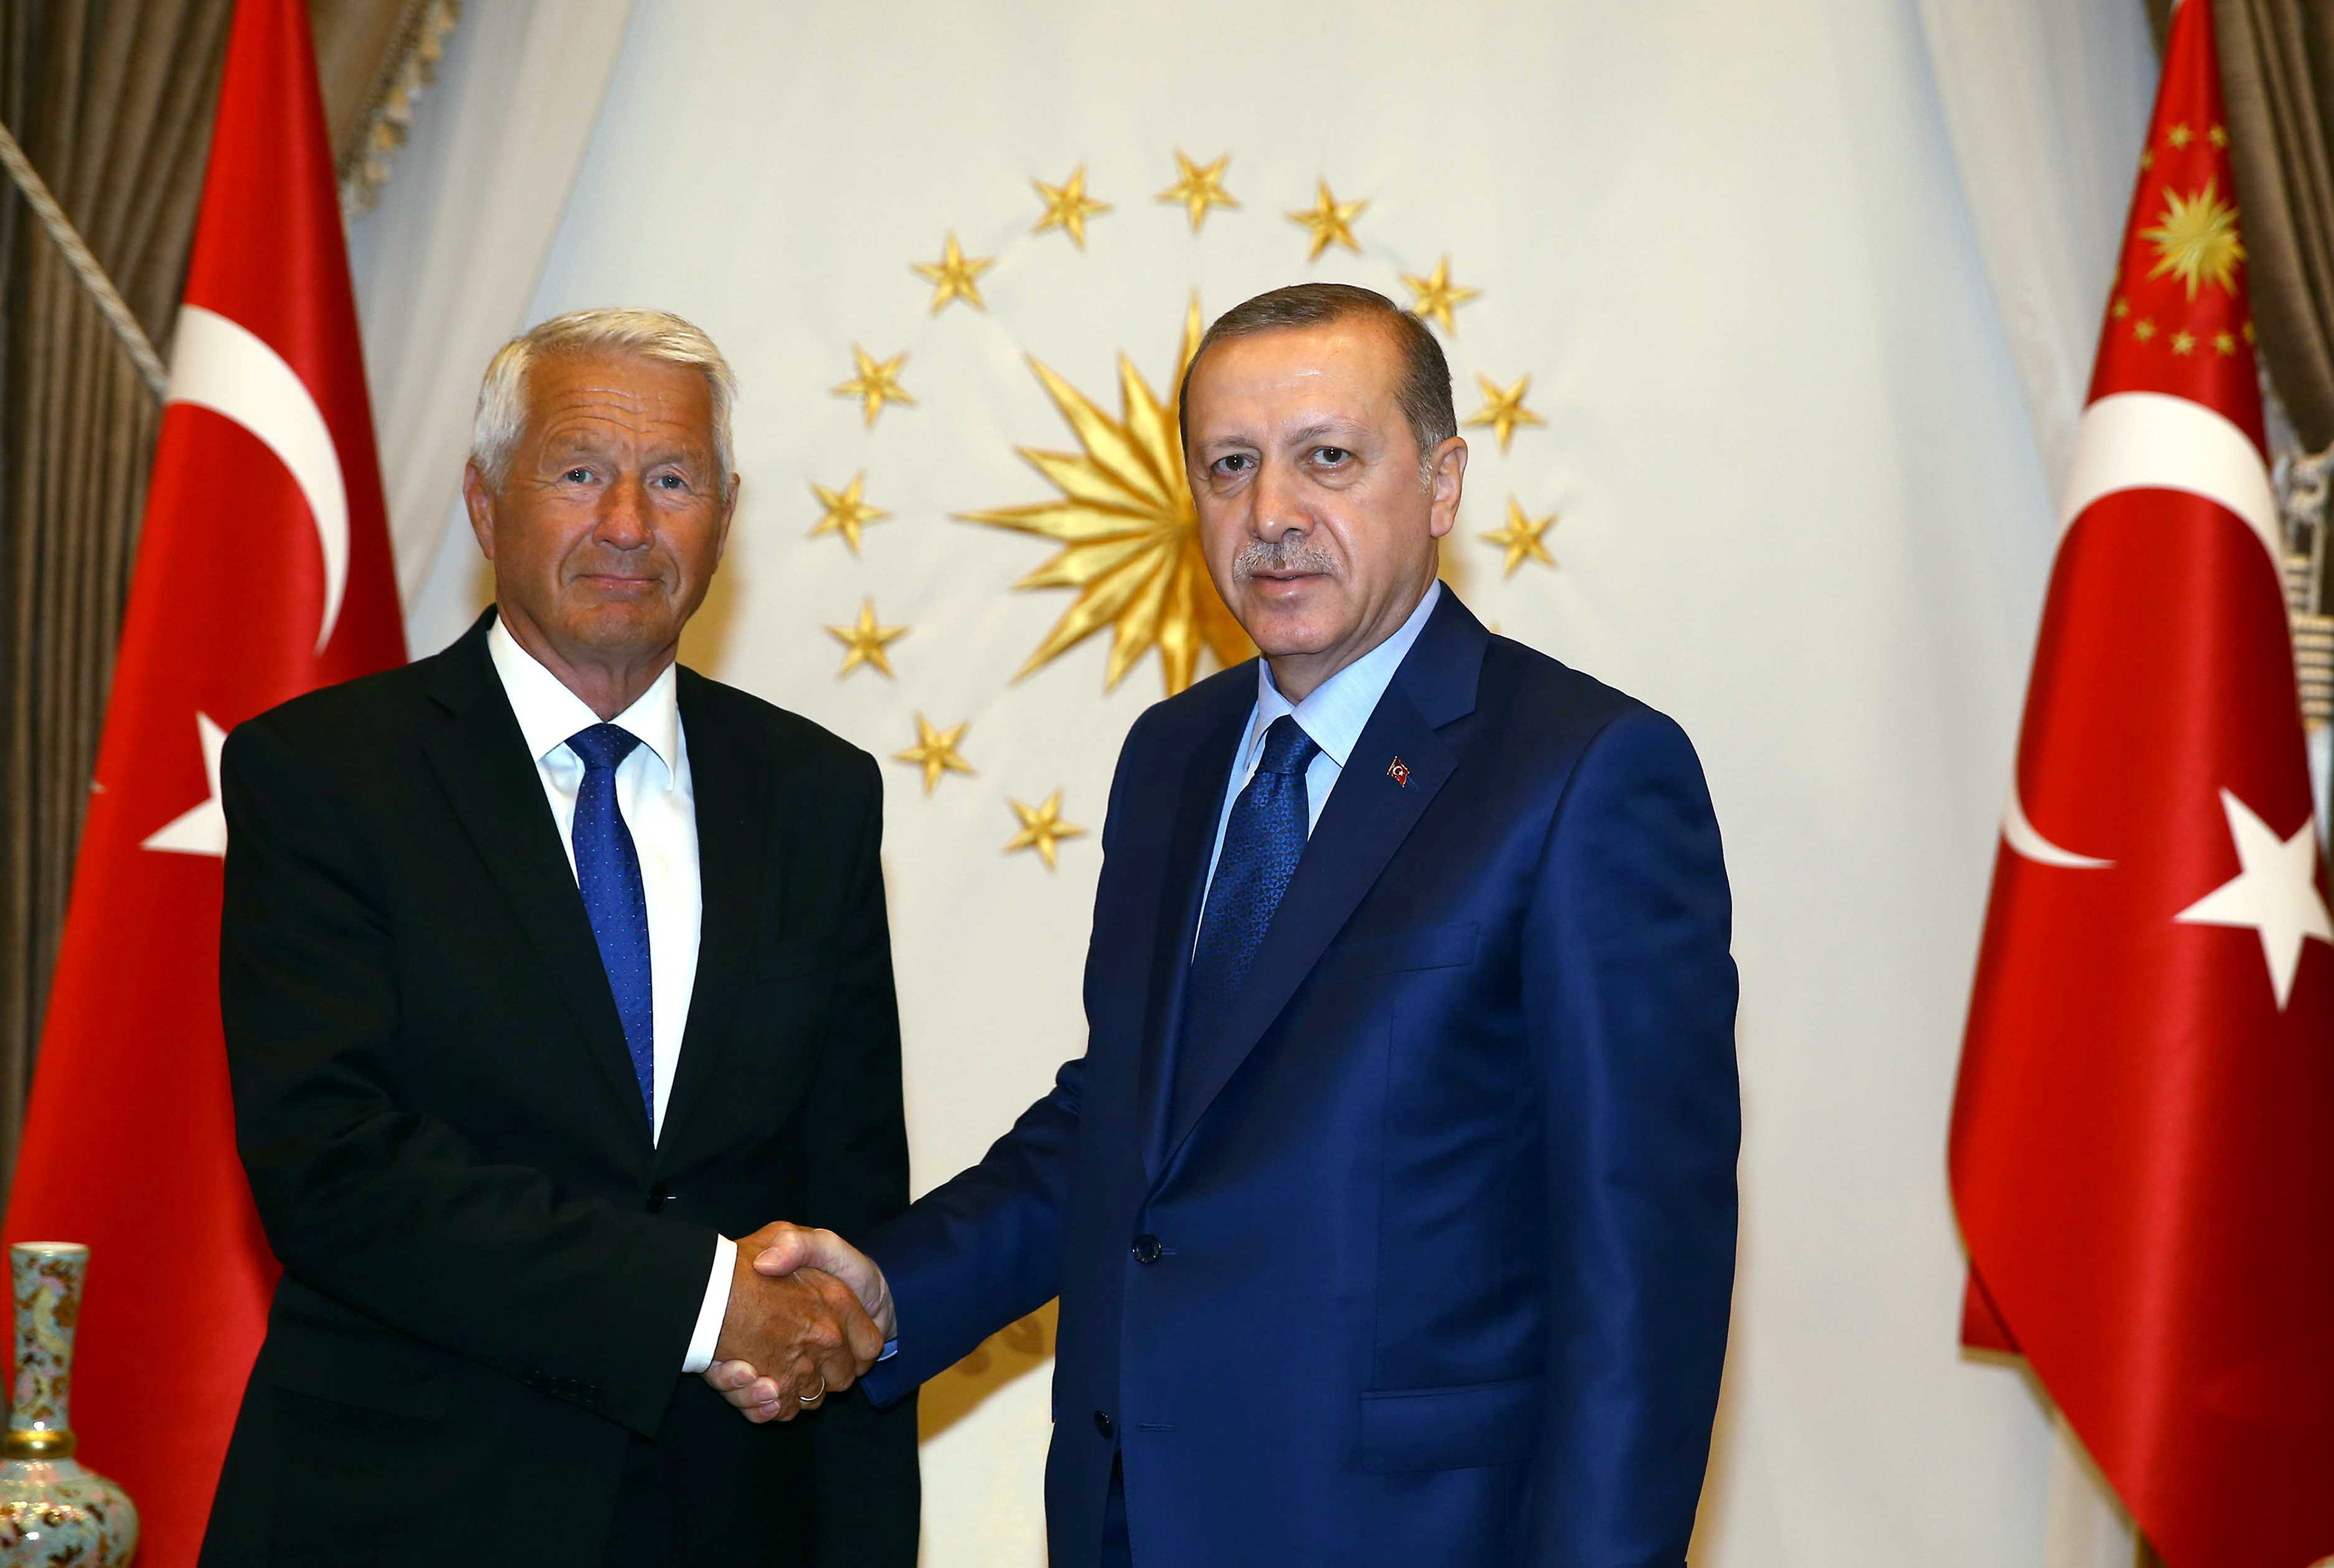 Jagland Erdogan 2016 08 03T150446Z 42243536 S1BETTIGIWAA RTRMADP 3 TURKEY SECURITY